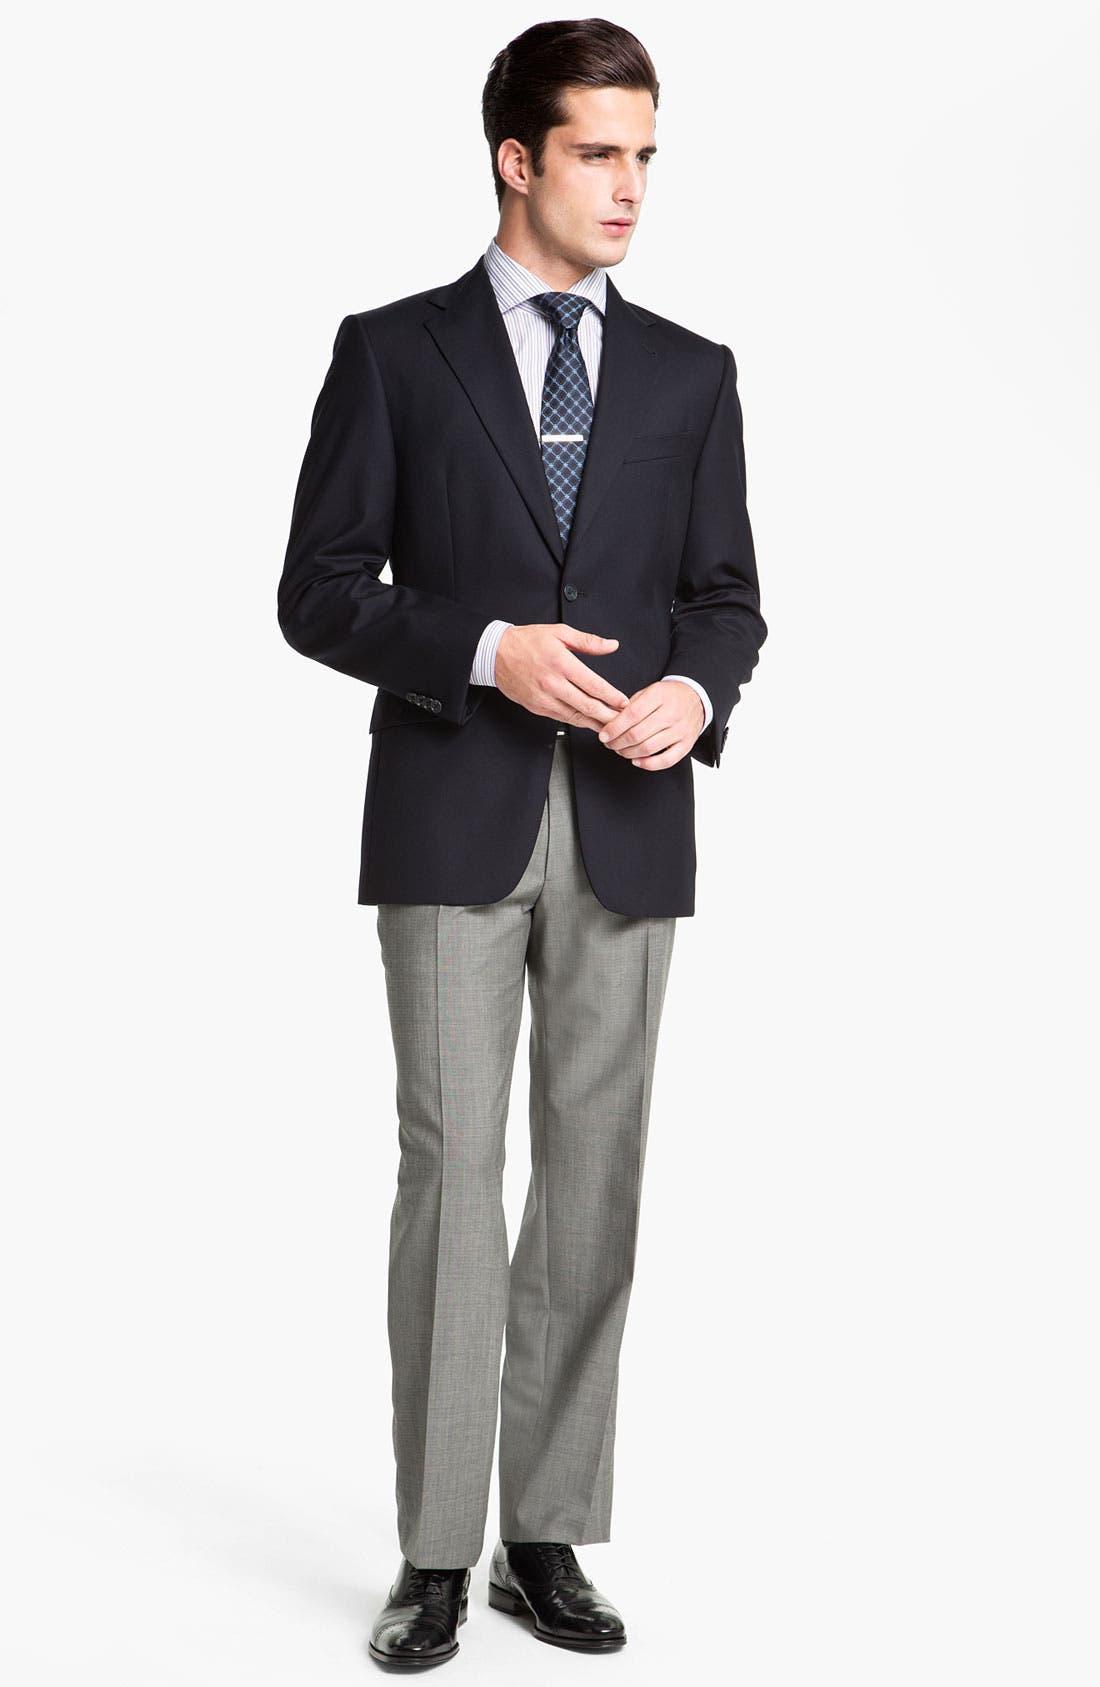 BOSS HUGO BOSS 'Jeffrey US' Flat Front Pinpoint Wool Trousers,                             Alternate thumbnail 4, color,                             022